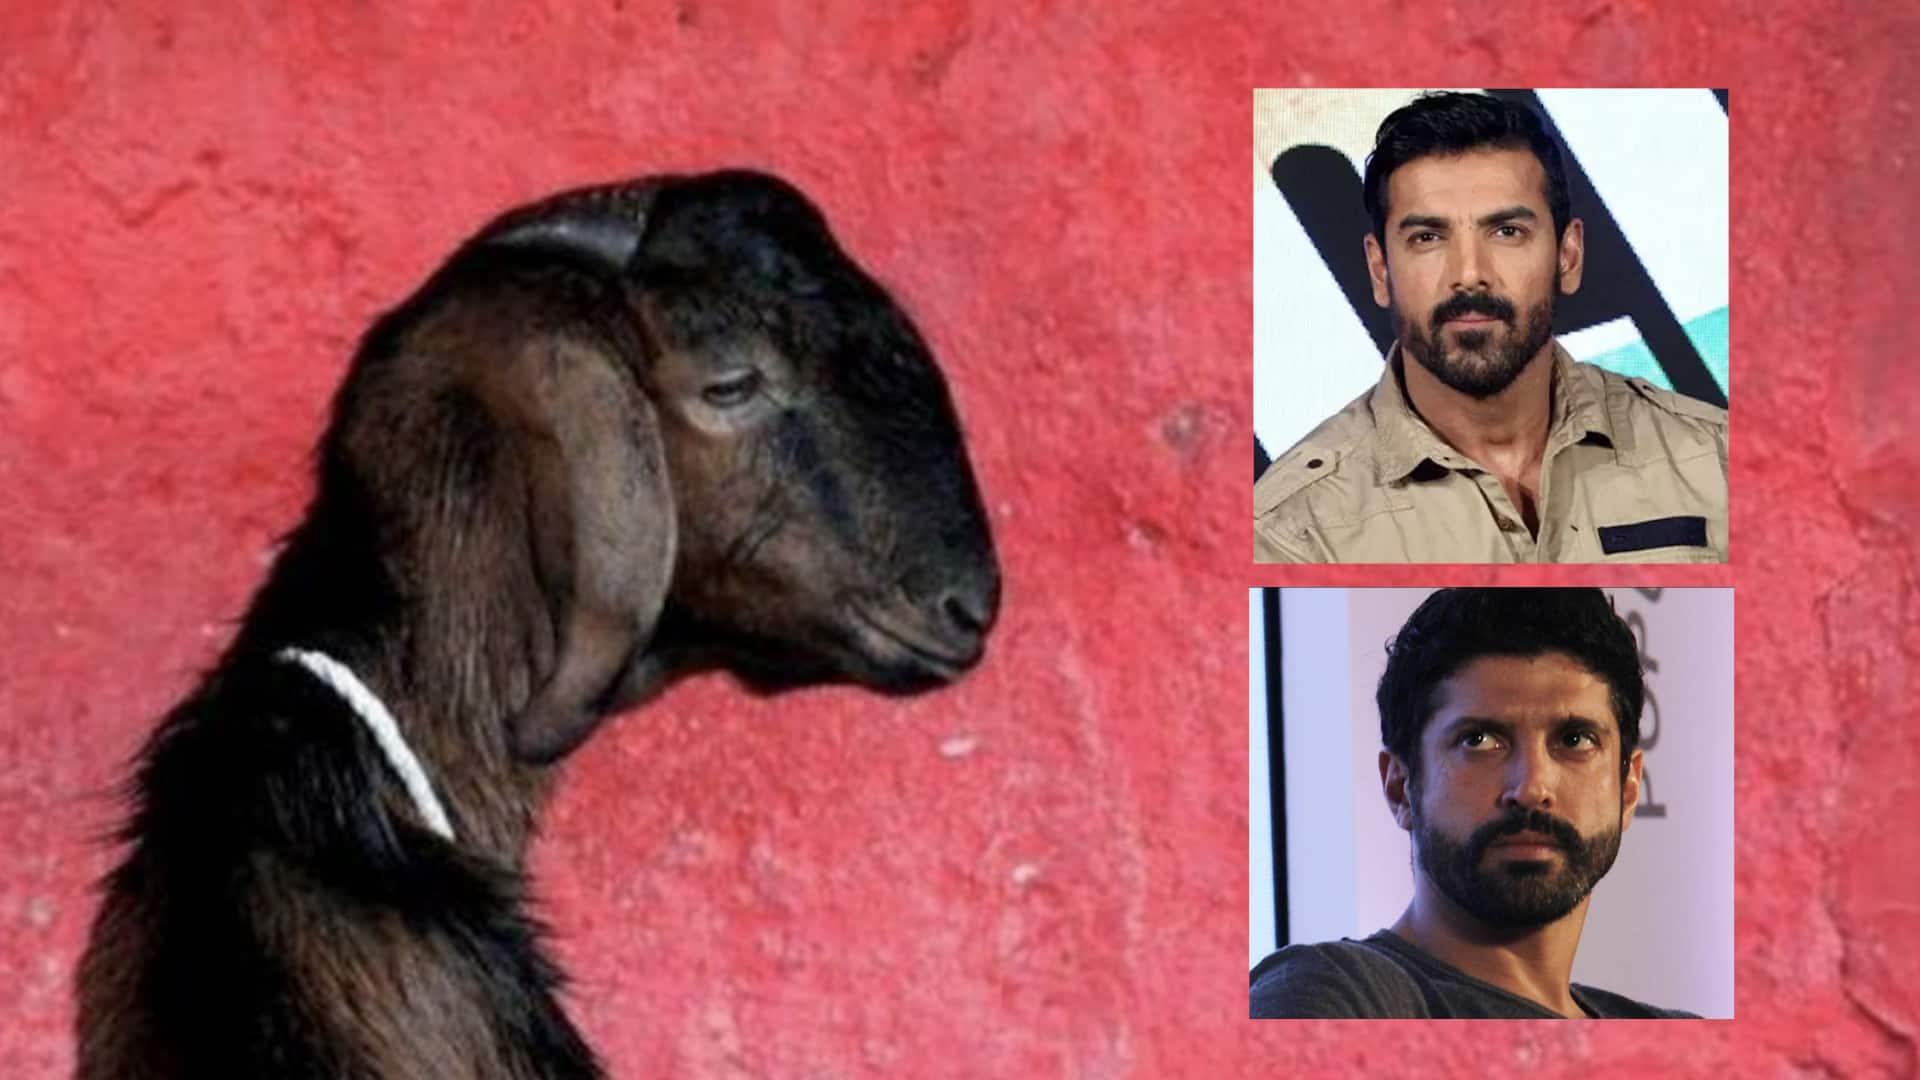 Goat gang rape John Abraham wants capital punishment for guilty Farhan Akhtar shocked